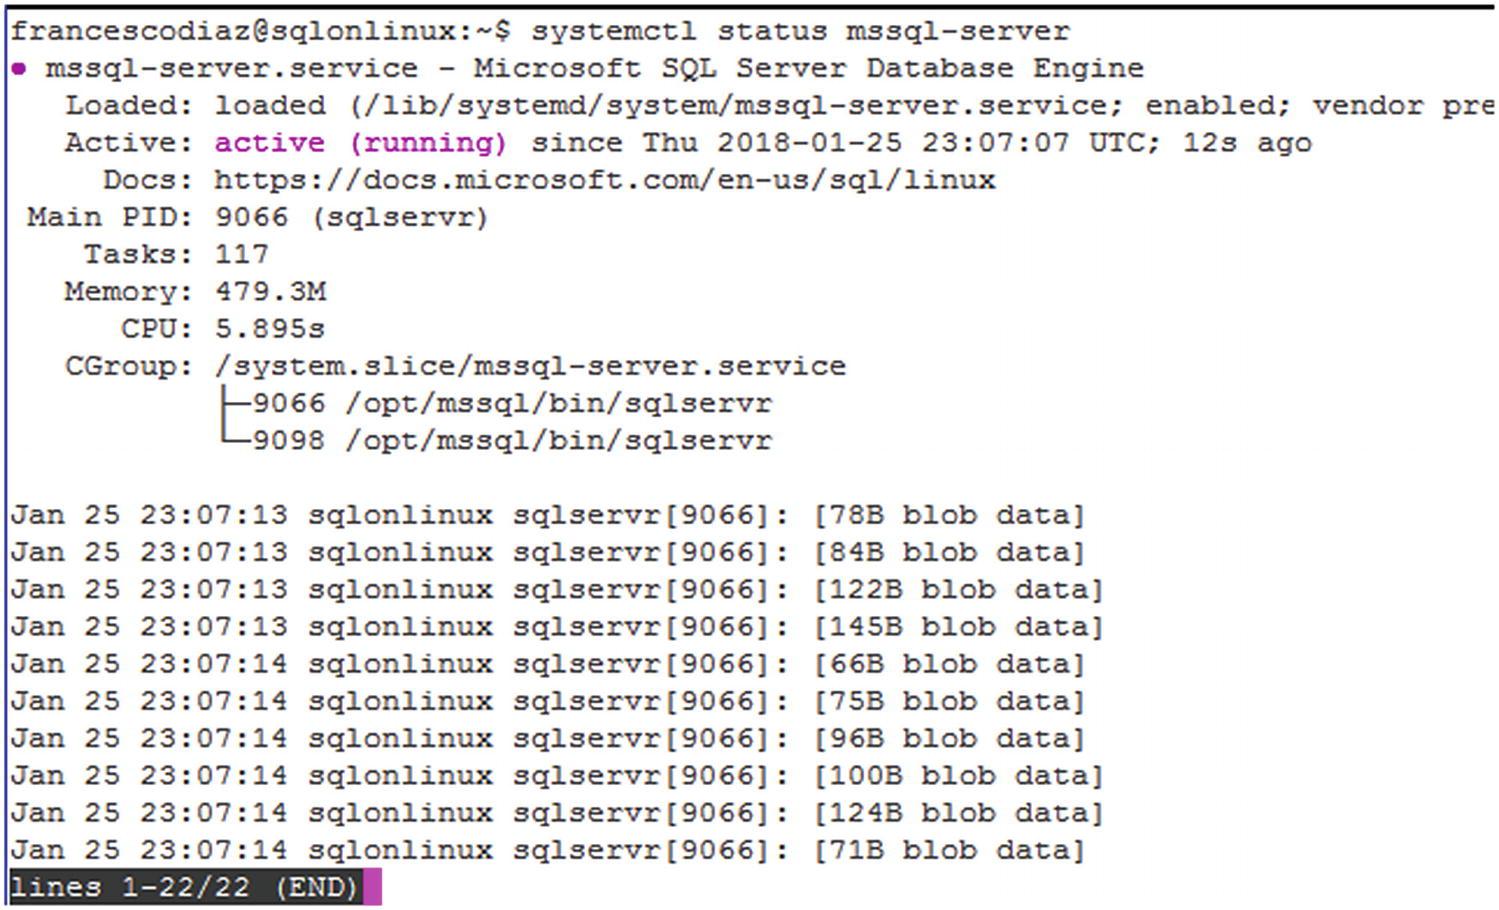 Working with SQL Server on Hybrid Cloud and Azure IaaS | SpringerLink